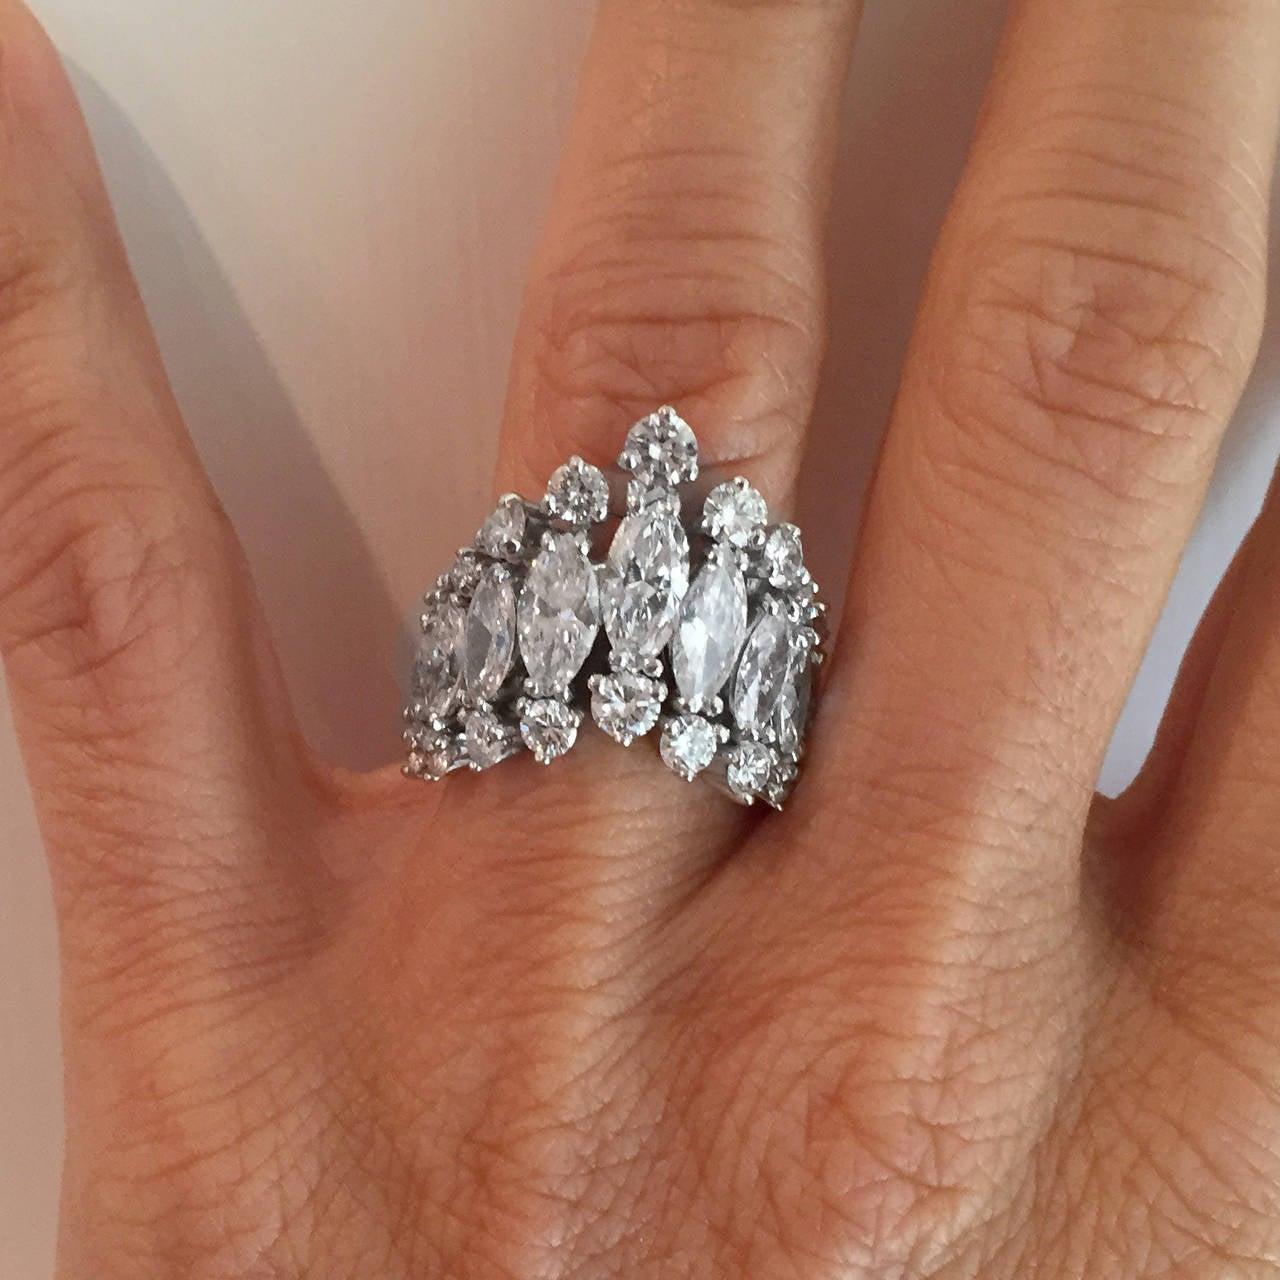 Carat Diamond Marquise Ring Images